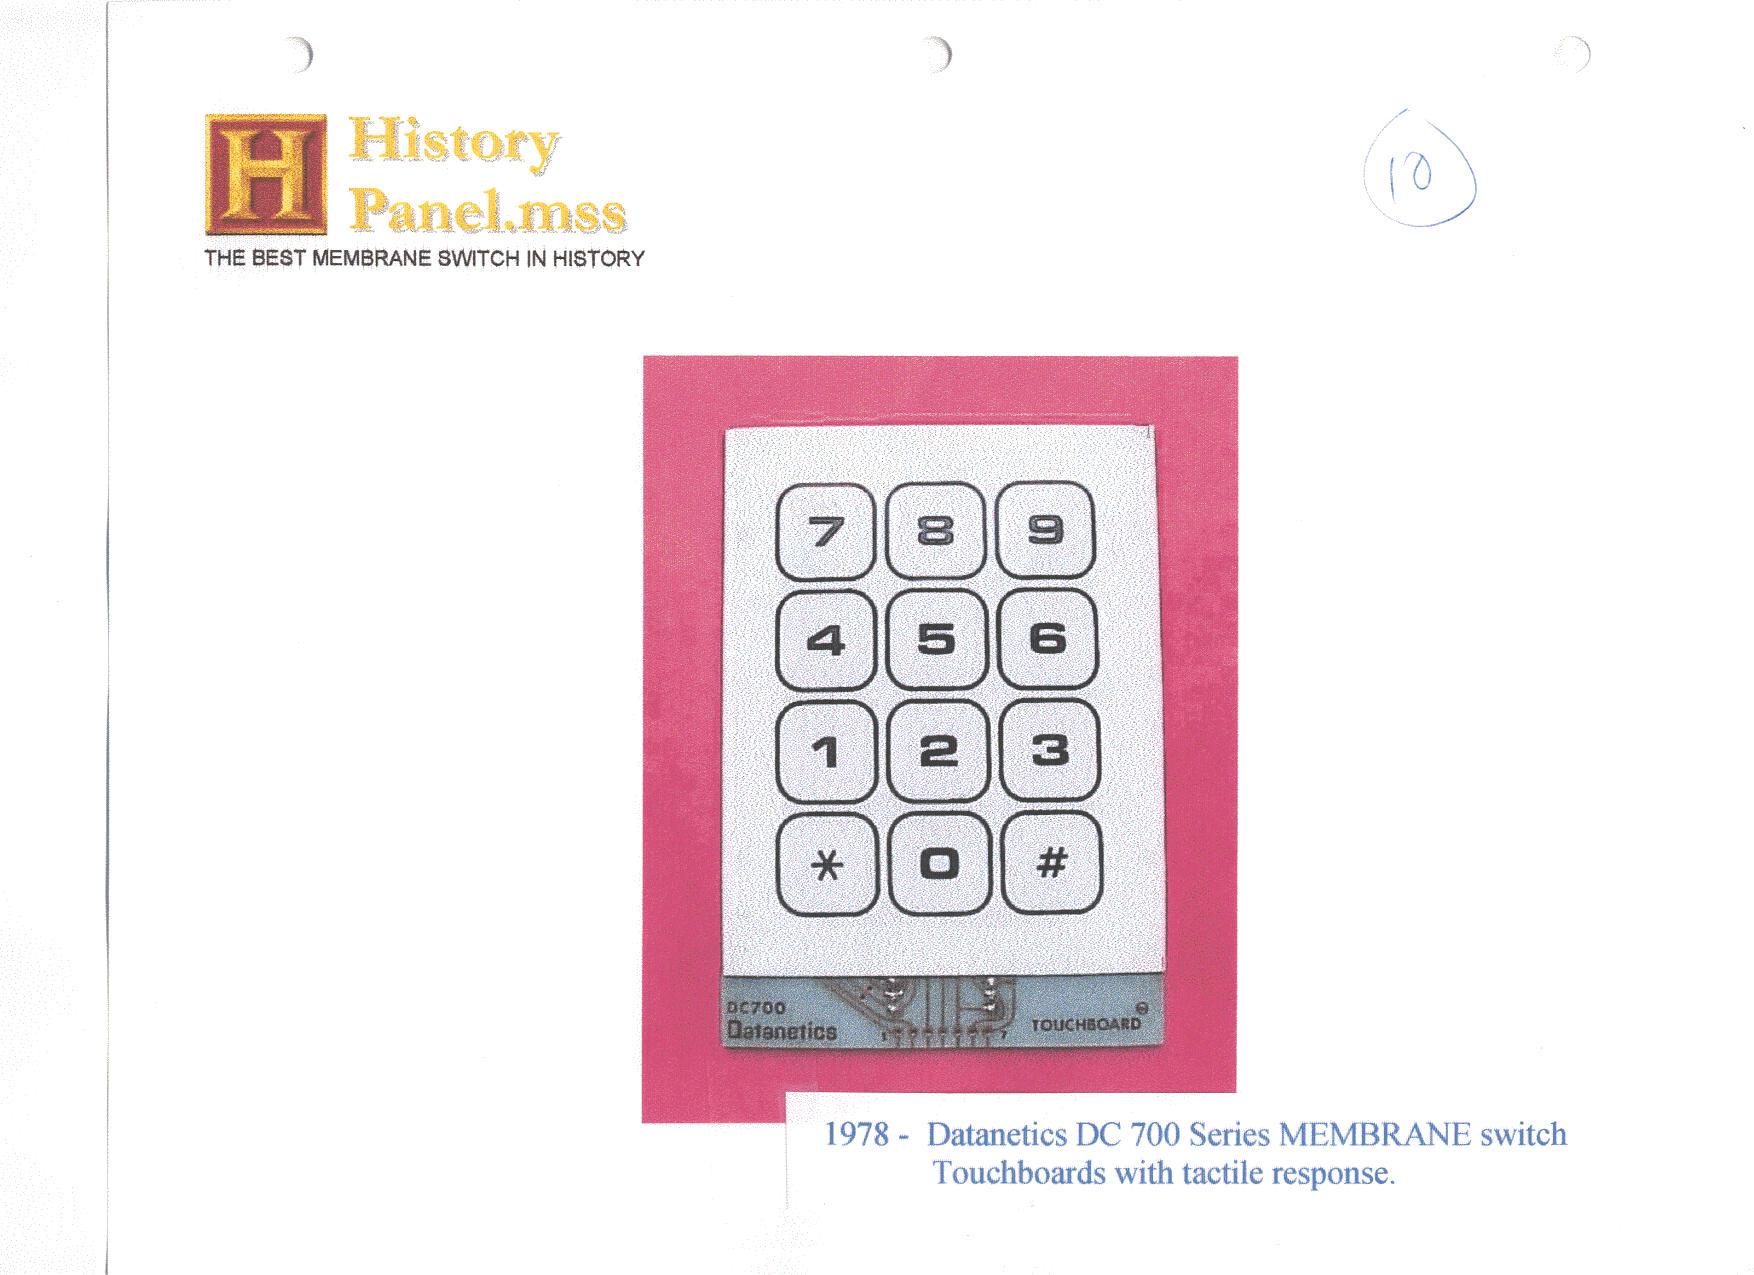 History Panel - pg 10.jpg